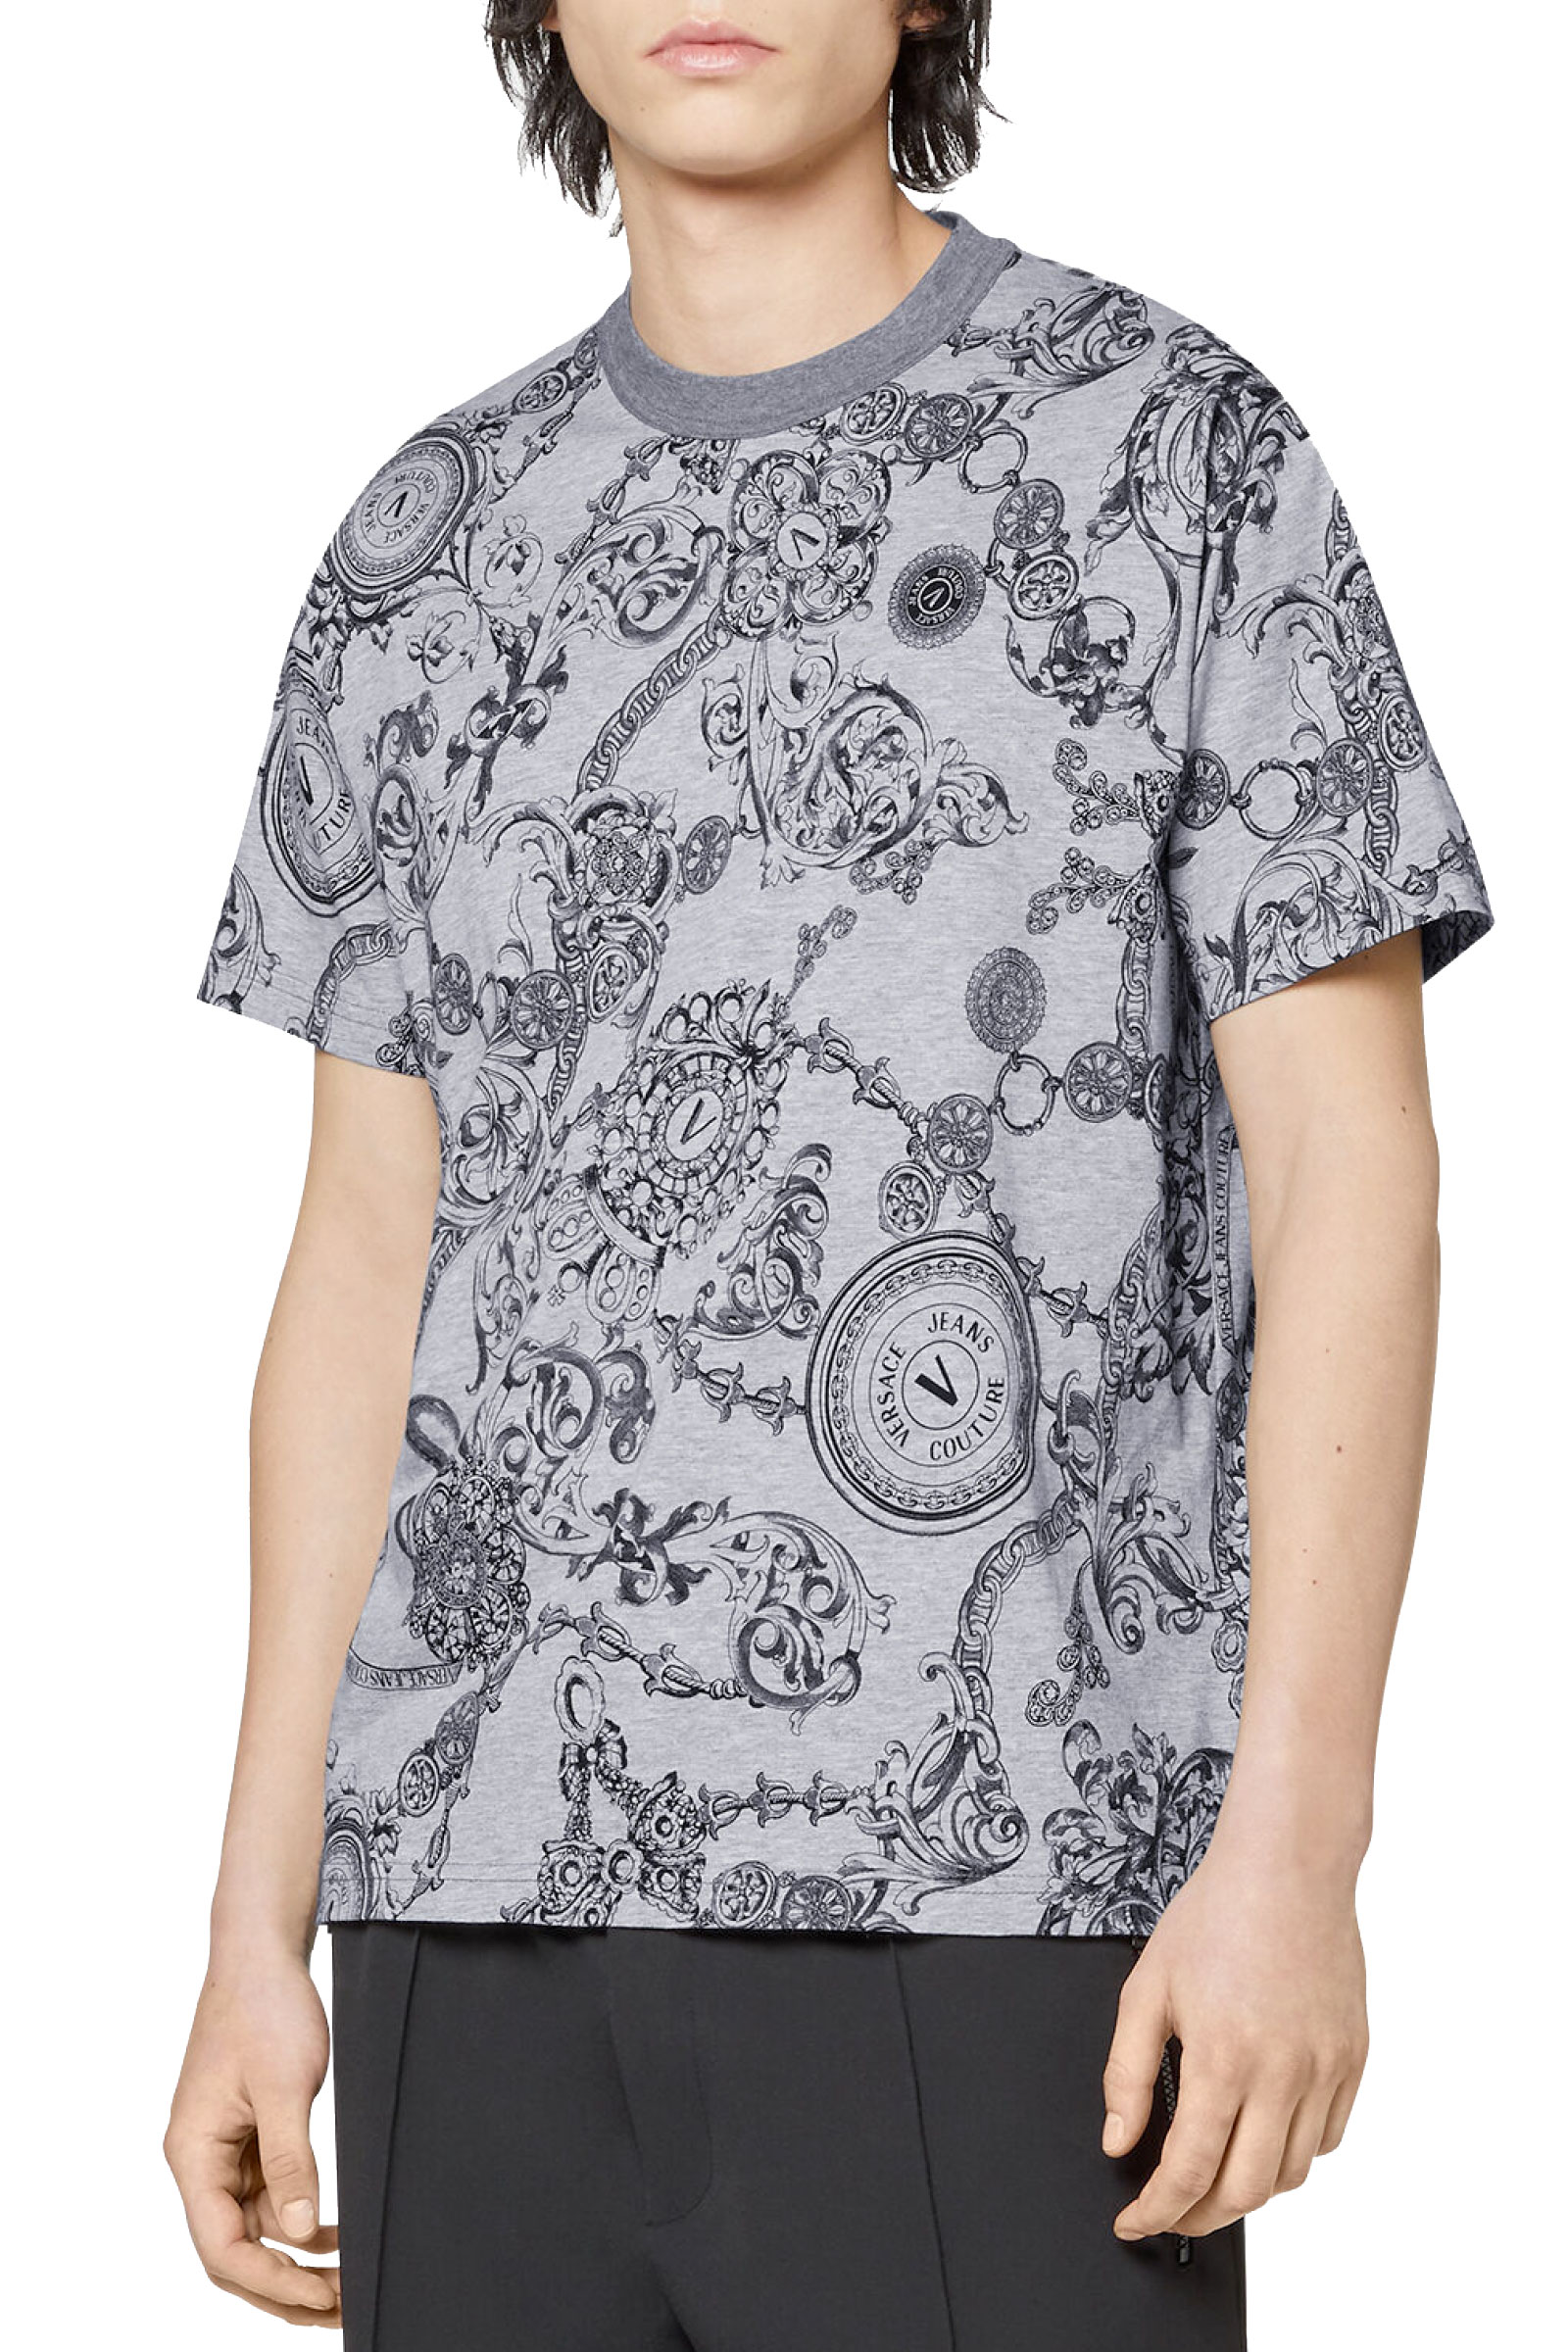 VERSACE JEANS COUTURE | T-Shirt | 71GAH6R1 JS017802